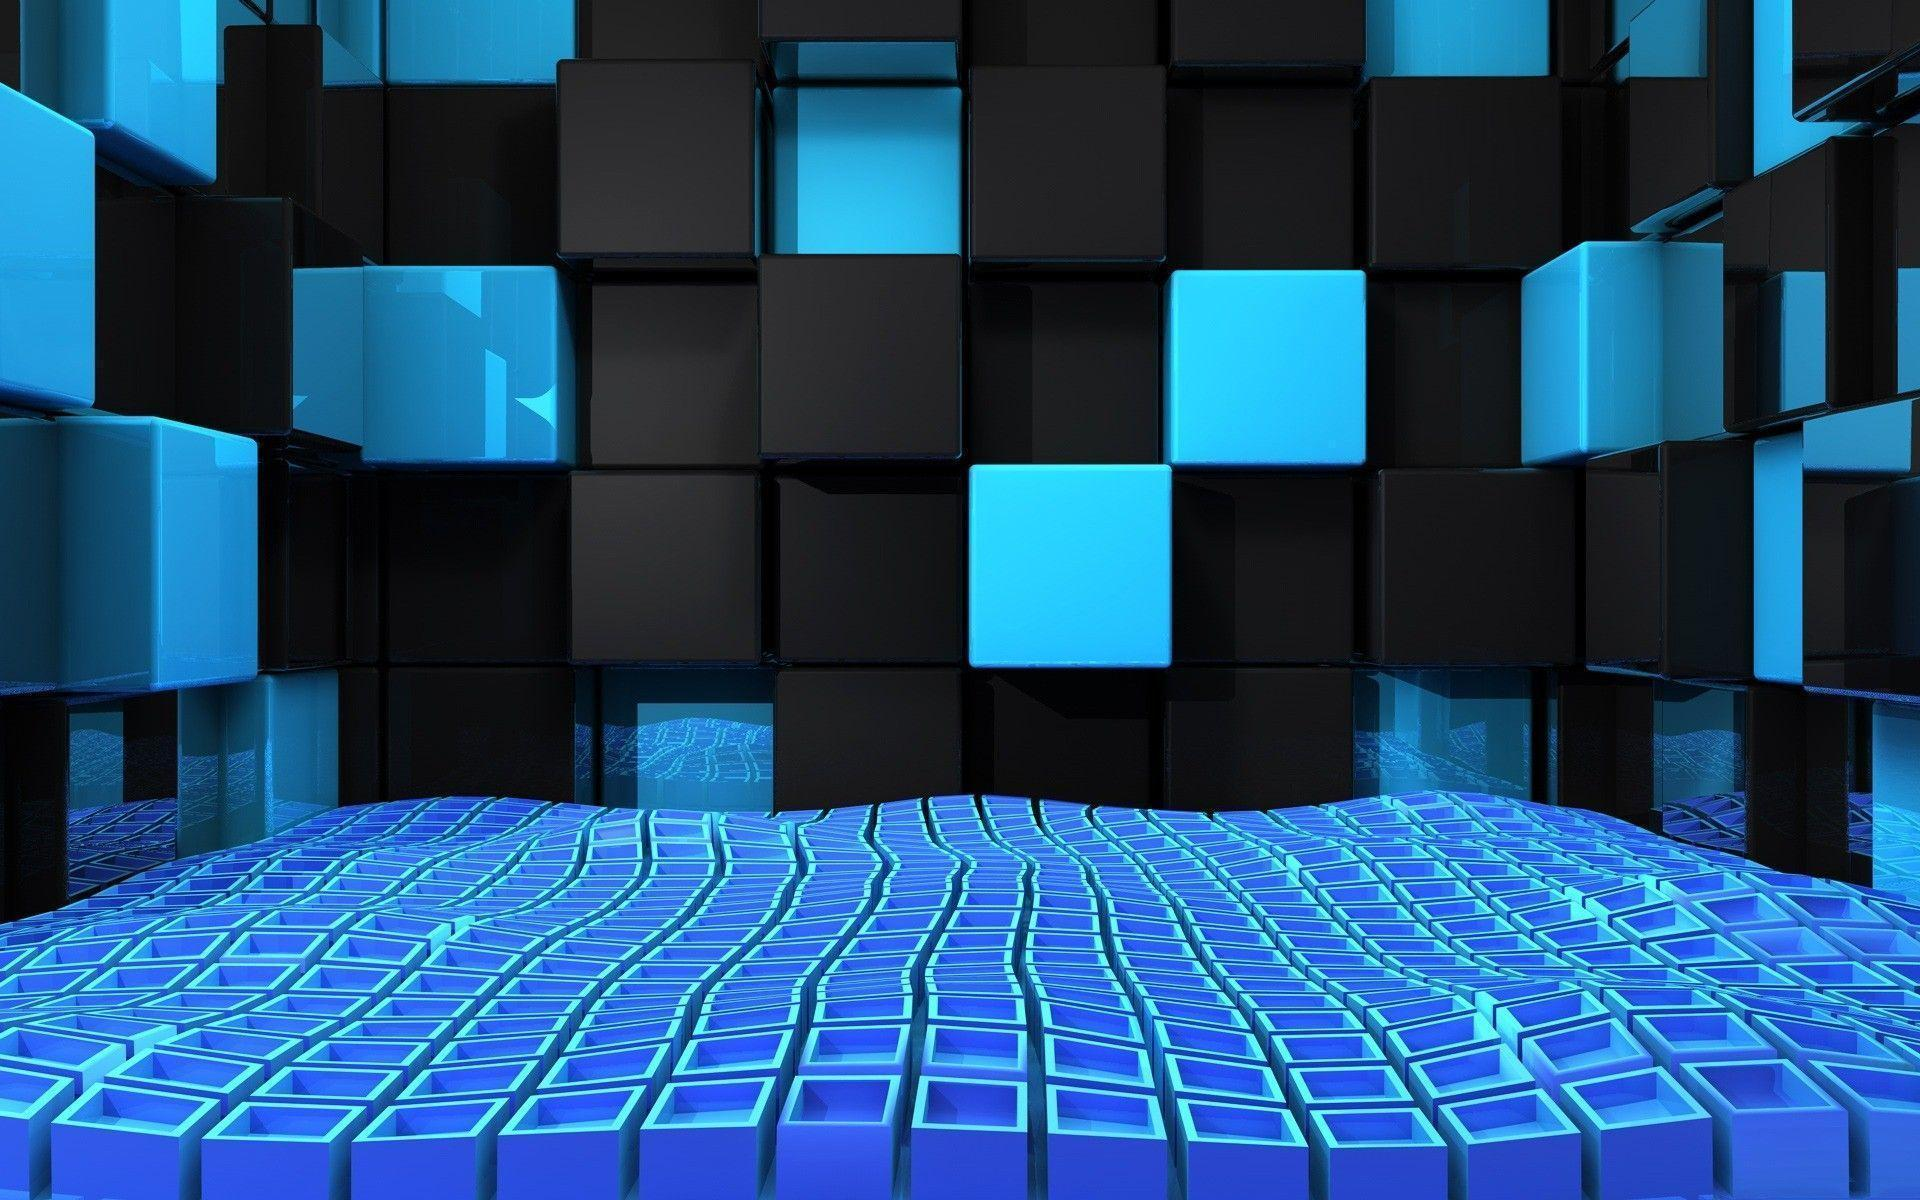 Blue Desktop Backgrounds Wallpaper Cave